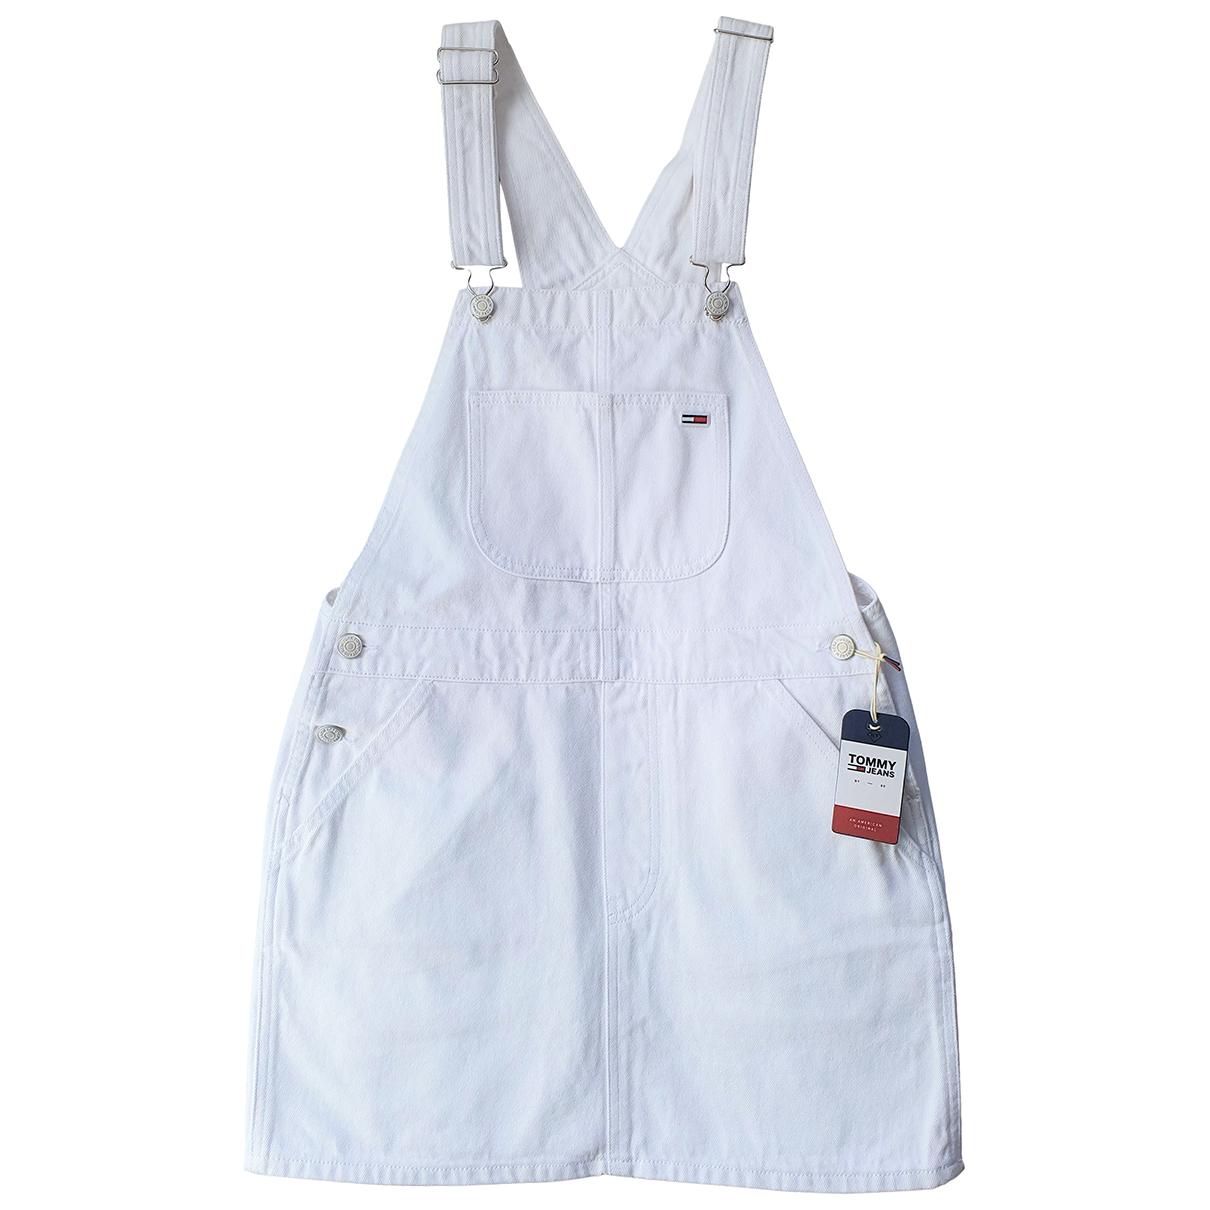 Tommy Jeans \N Kleid in  Weiss Baumwolle